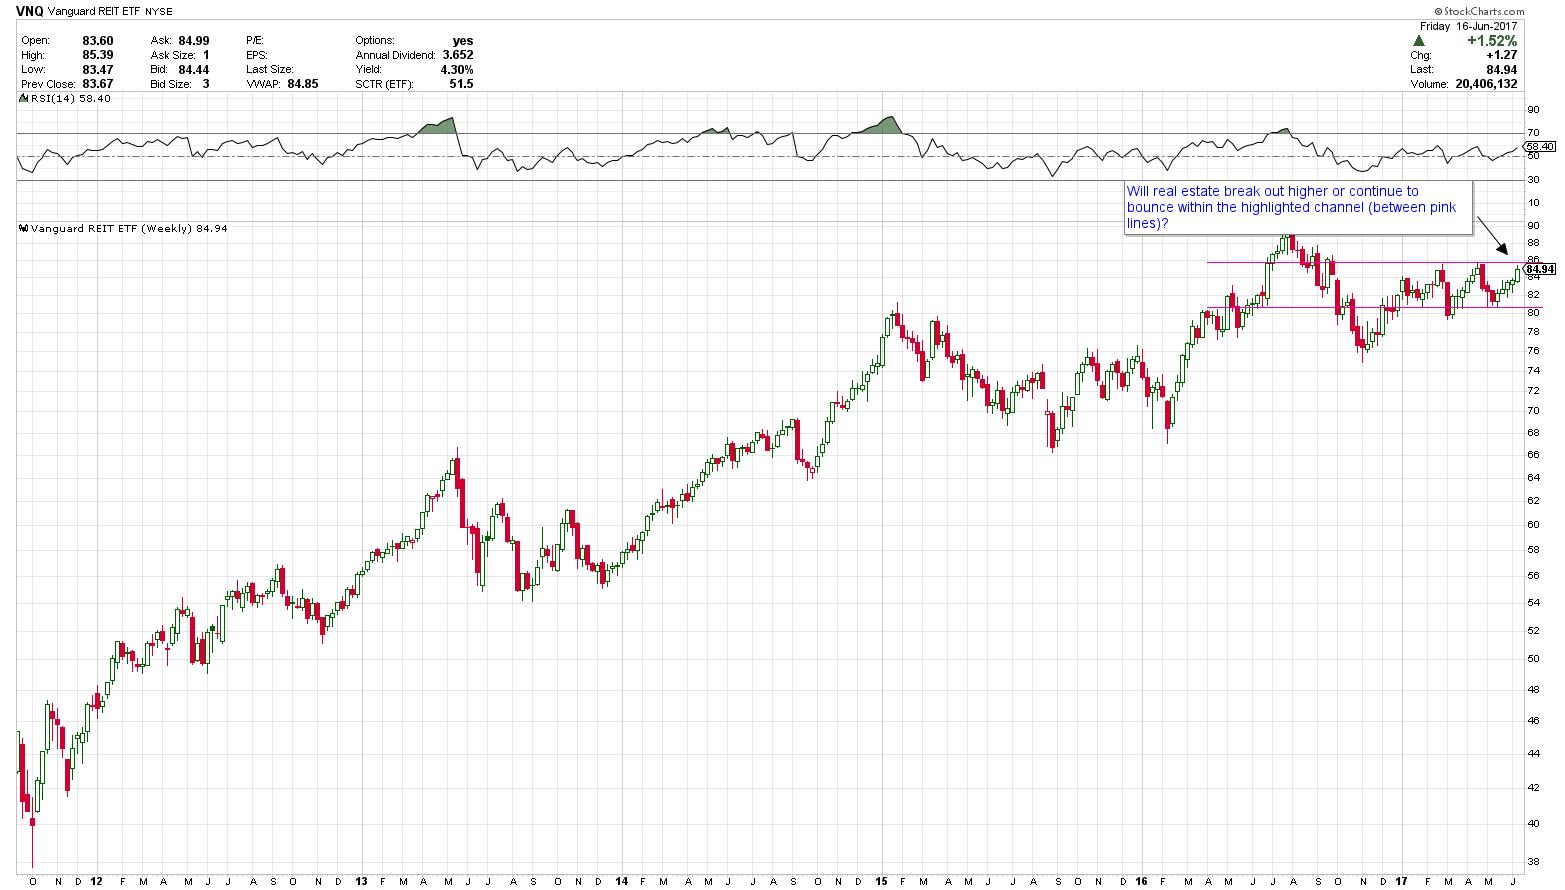 (chart created in stockcharts.com)